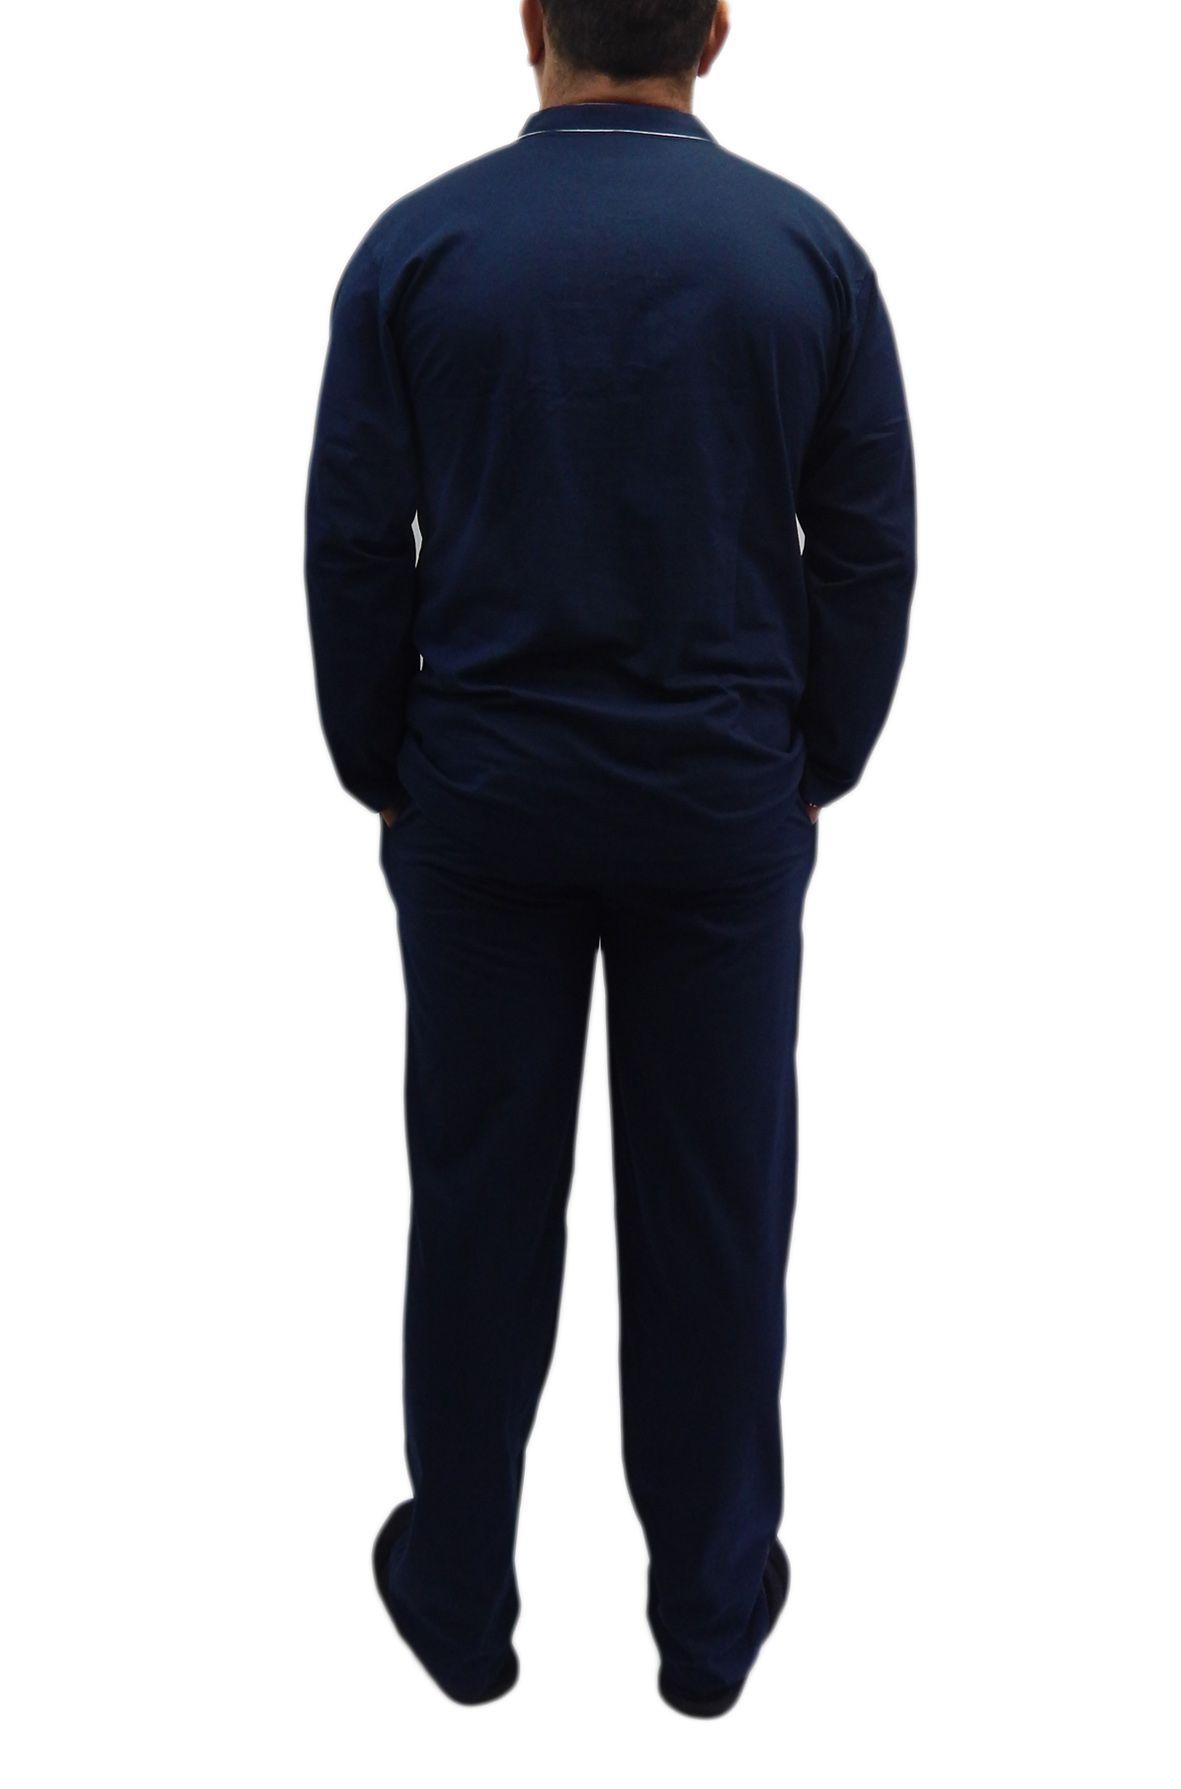 Pijama Masculino Plus Size todo aberto Manga Longa Tamanho 50-54 Foxx 262035